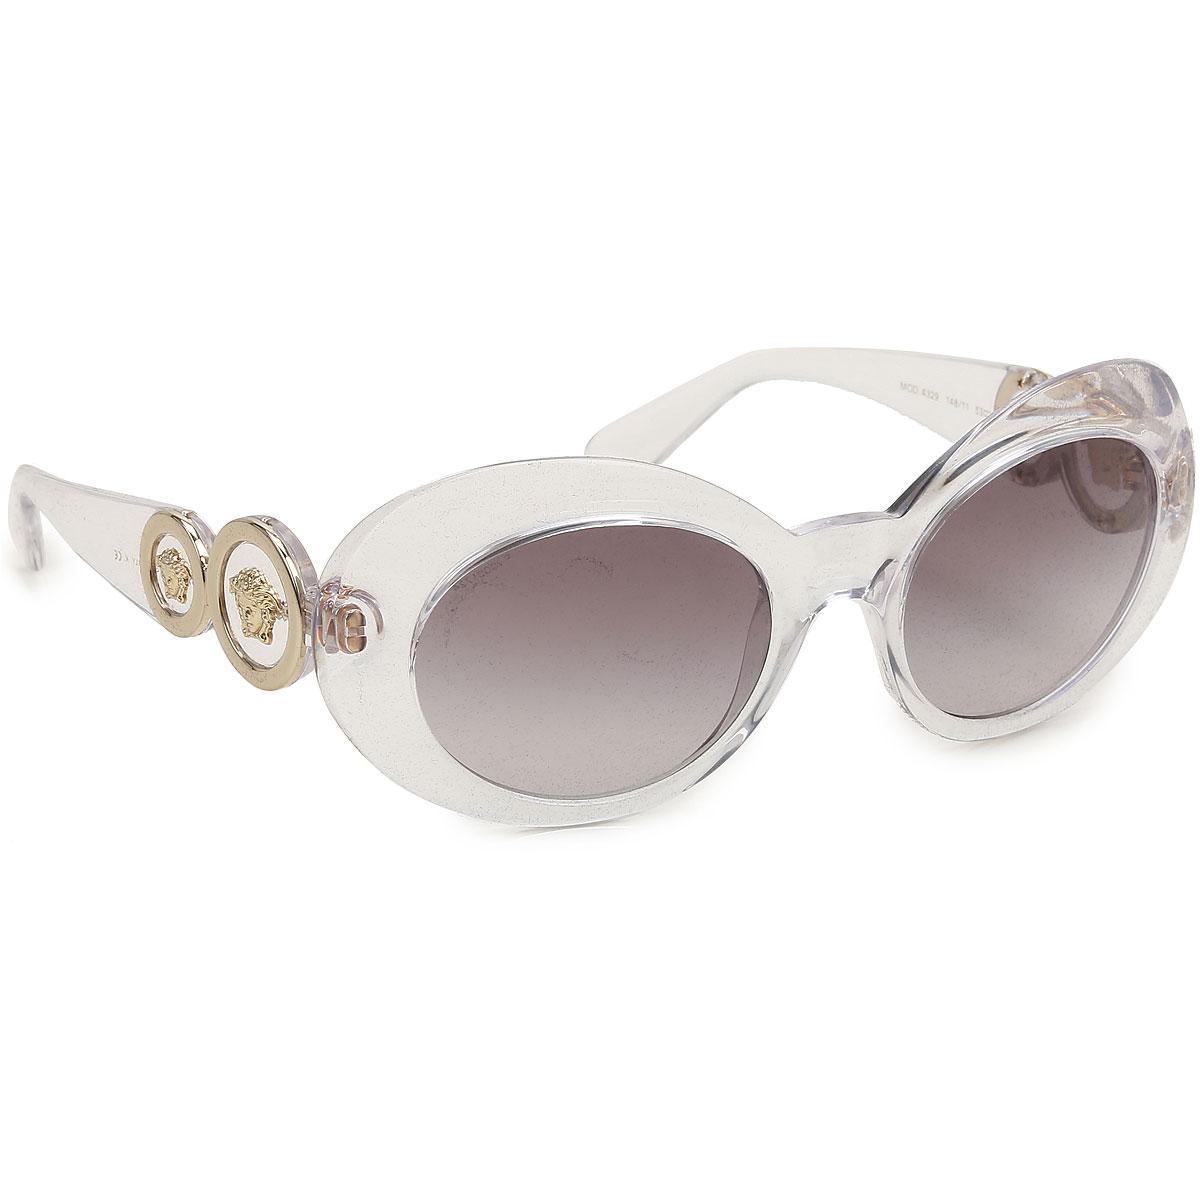 Gianni Versace Sunglasses On Sale, Crystal, 2019